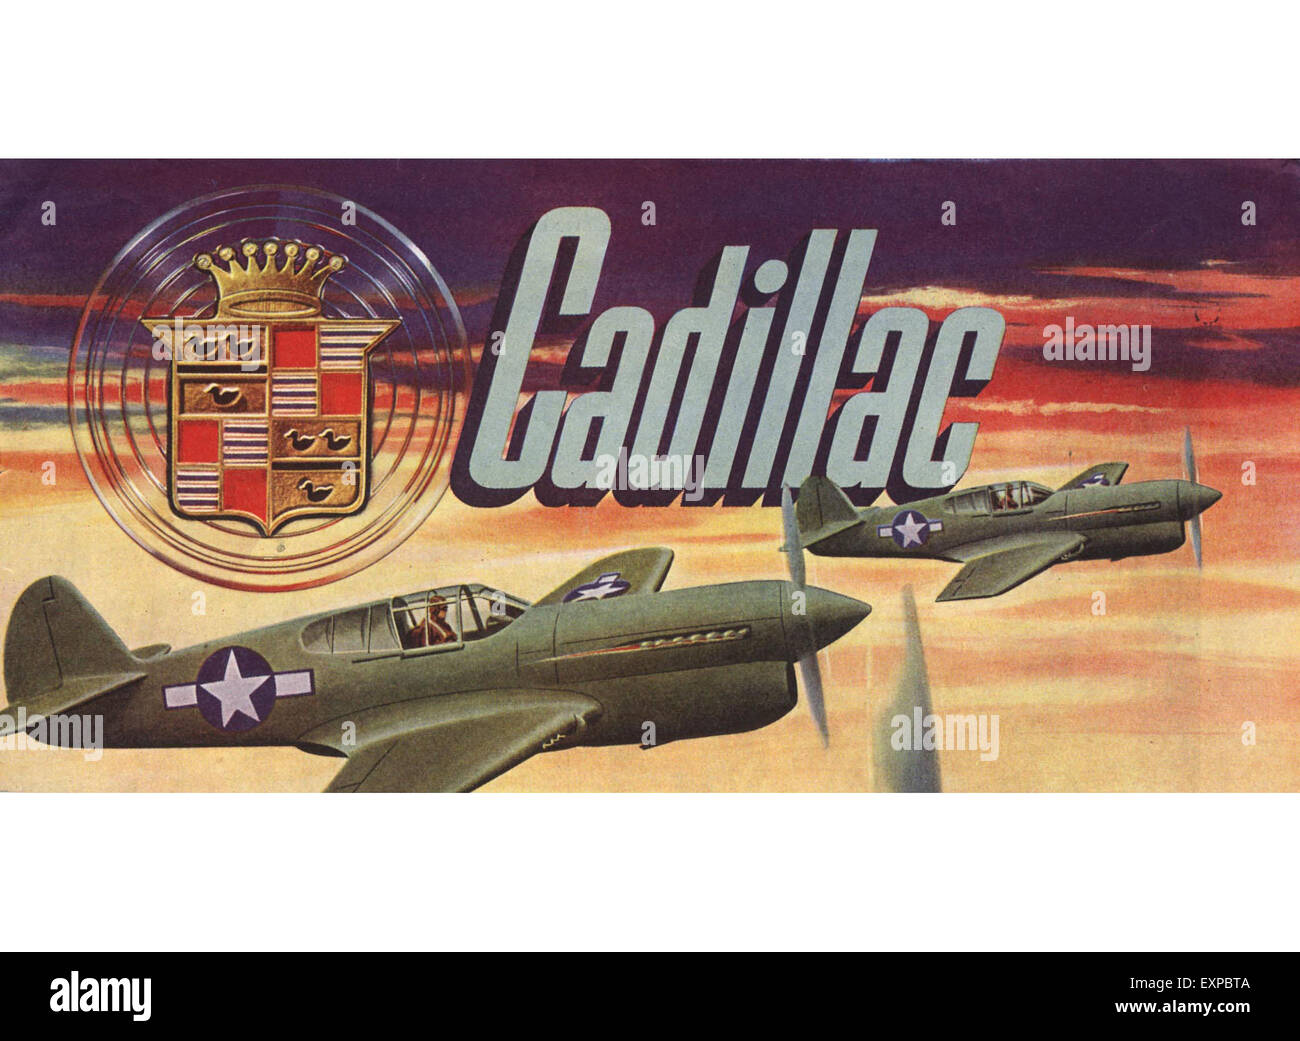 1940s USA Cadillac Magazine Advert - Stock Image